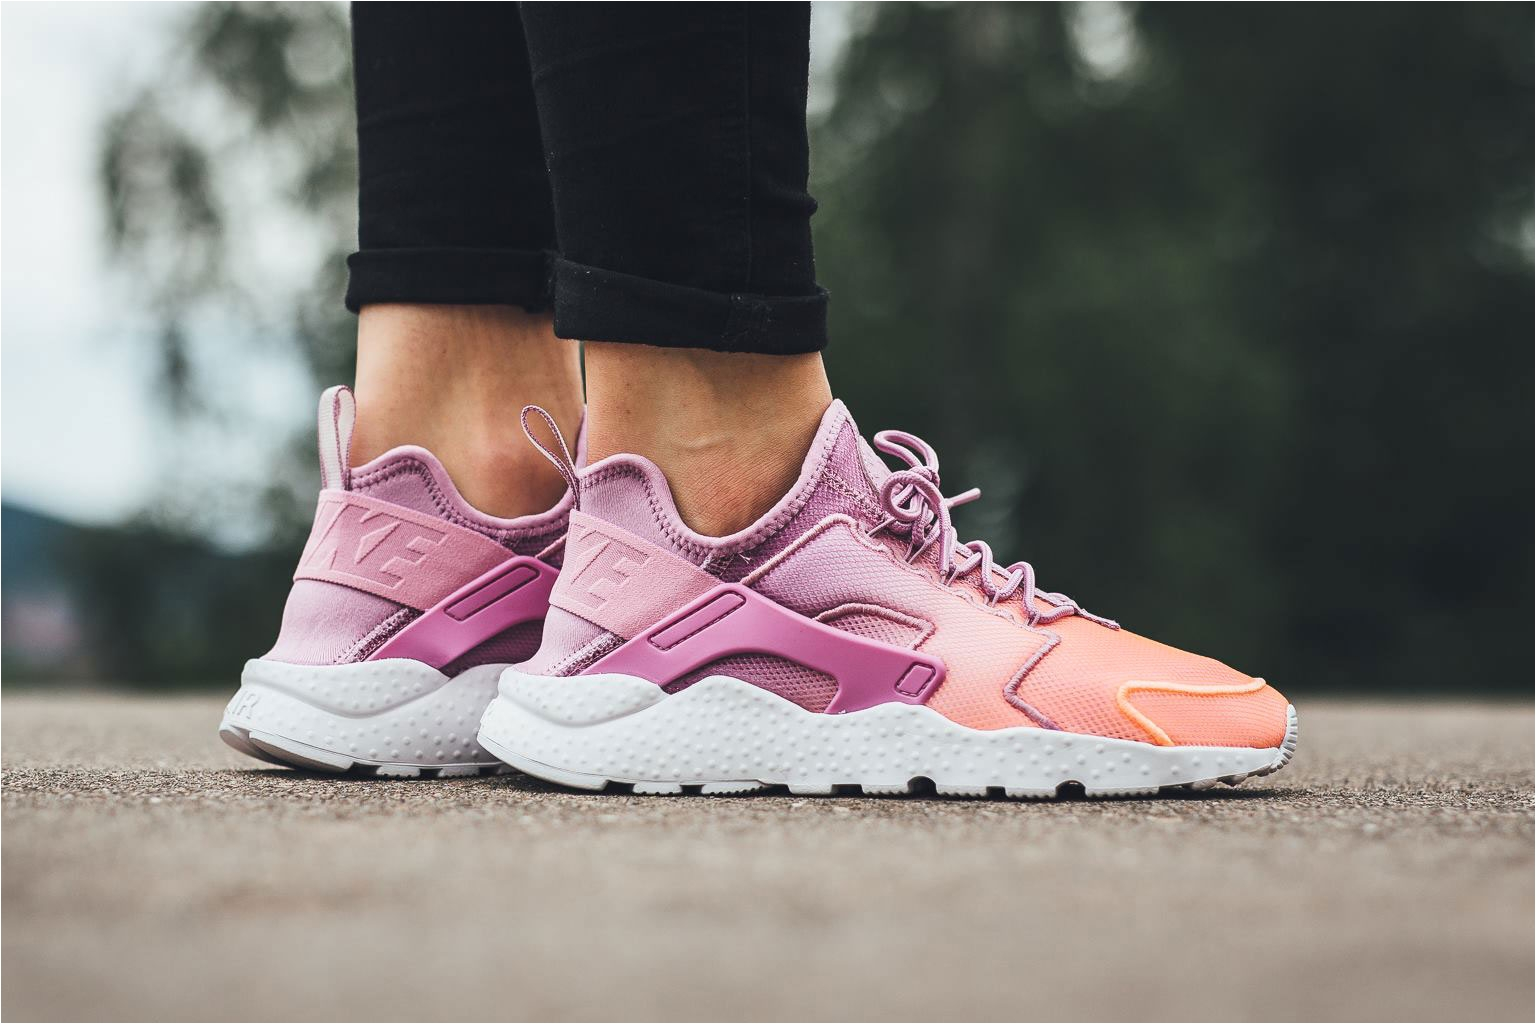 Light Pink Huaraches Womens Nike Air Huarache Ultra Breathe orchid Sunset Glow Trainer